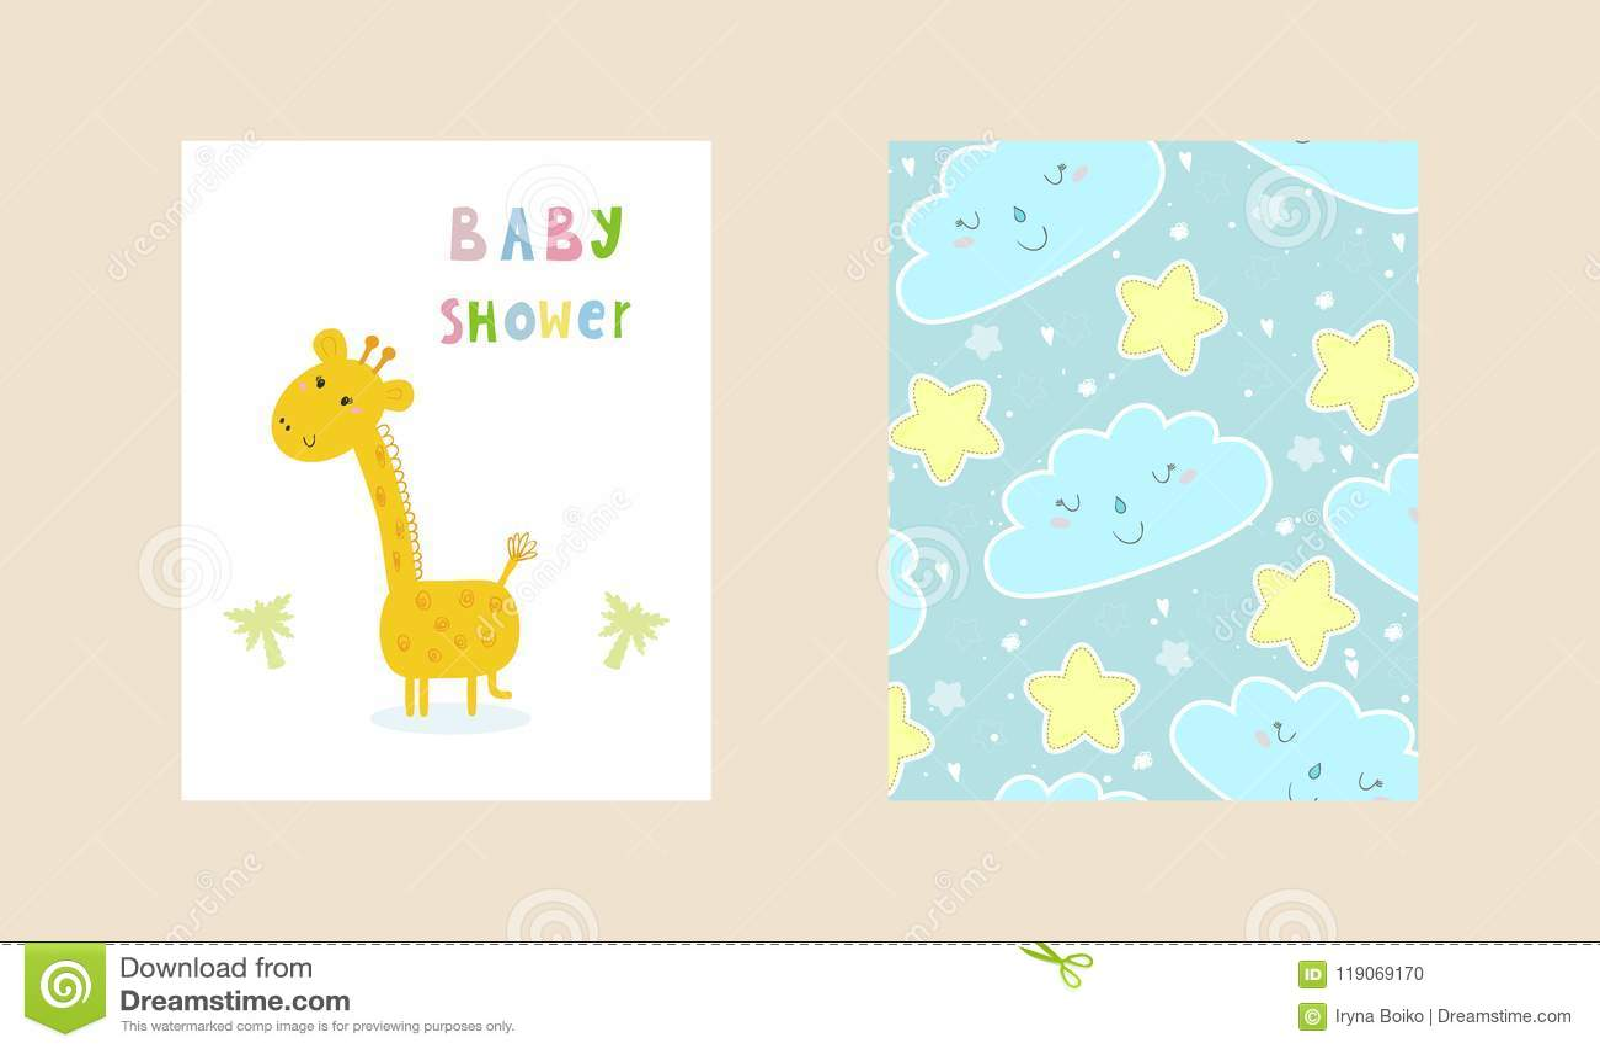 Baby Shower Card Design Cute Hand Drawn Card With Giraffe